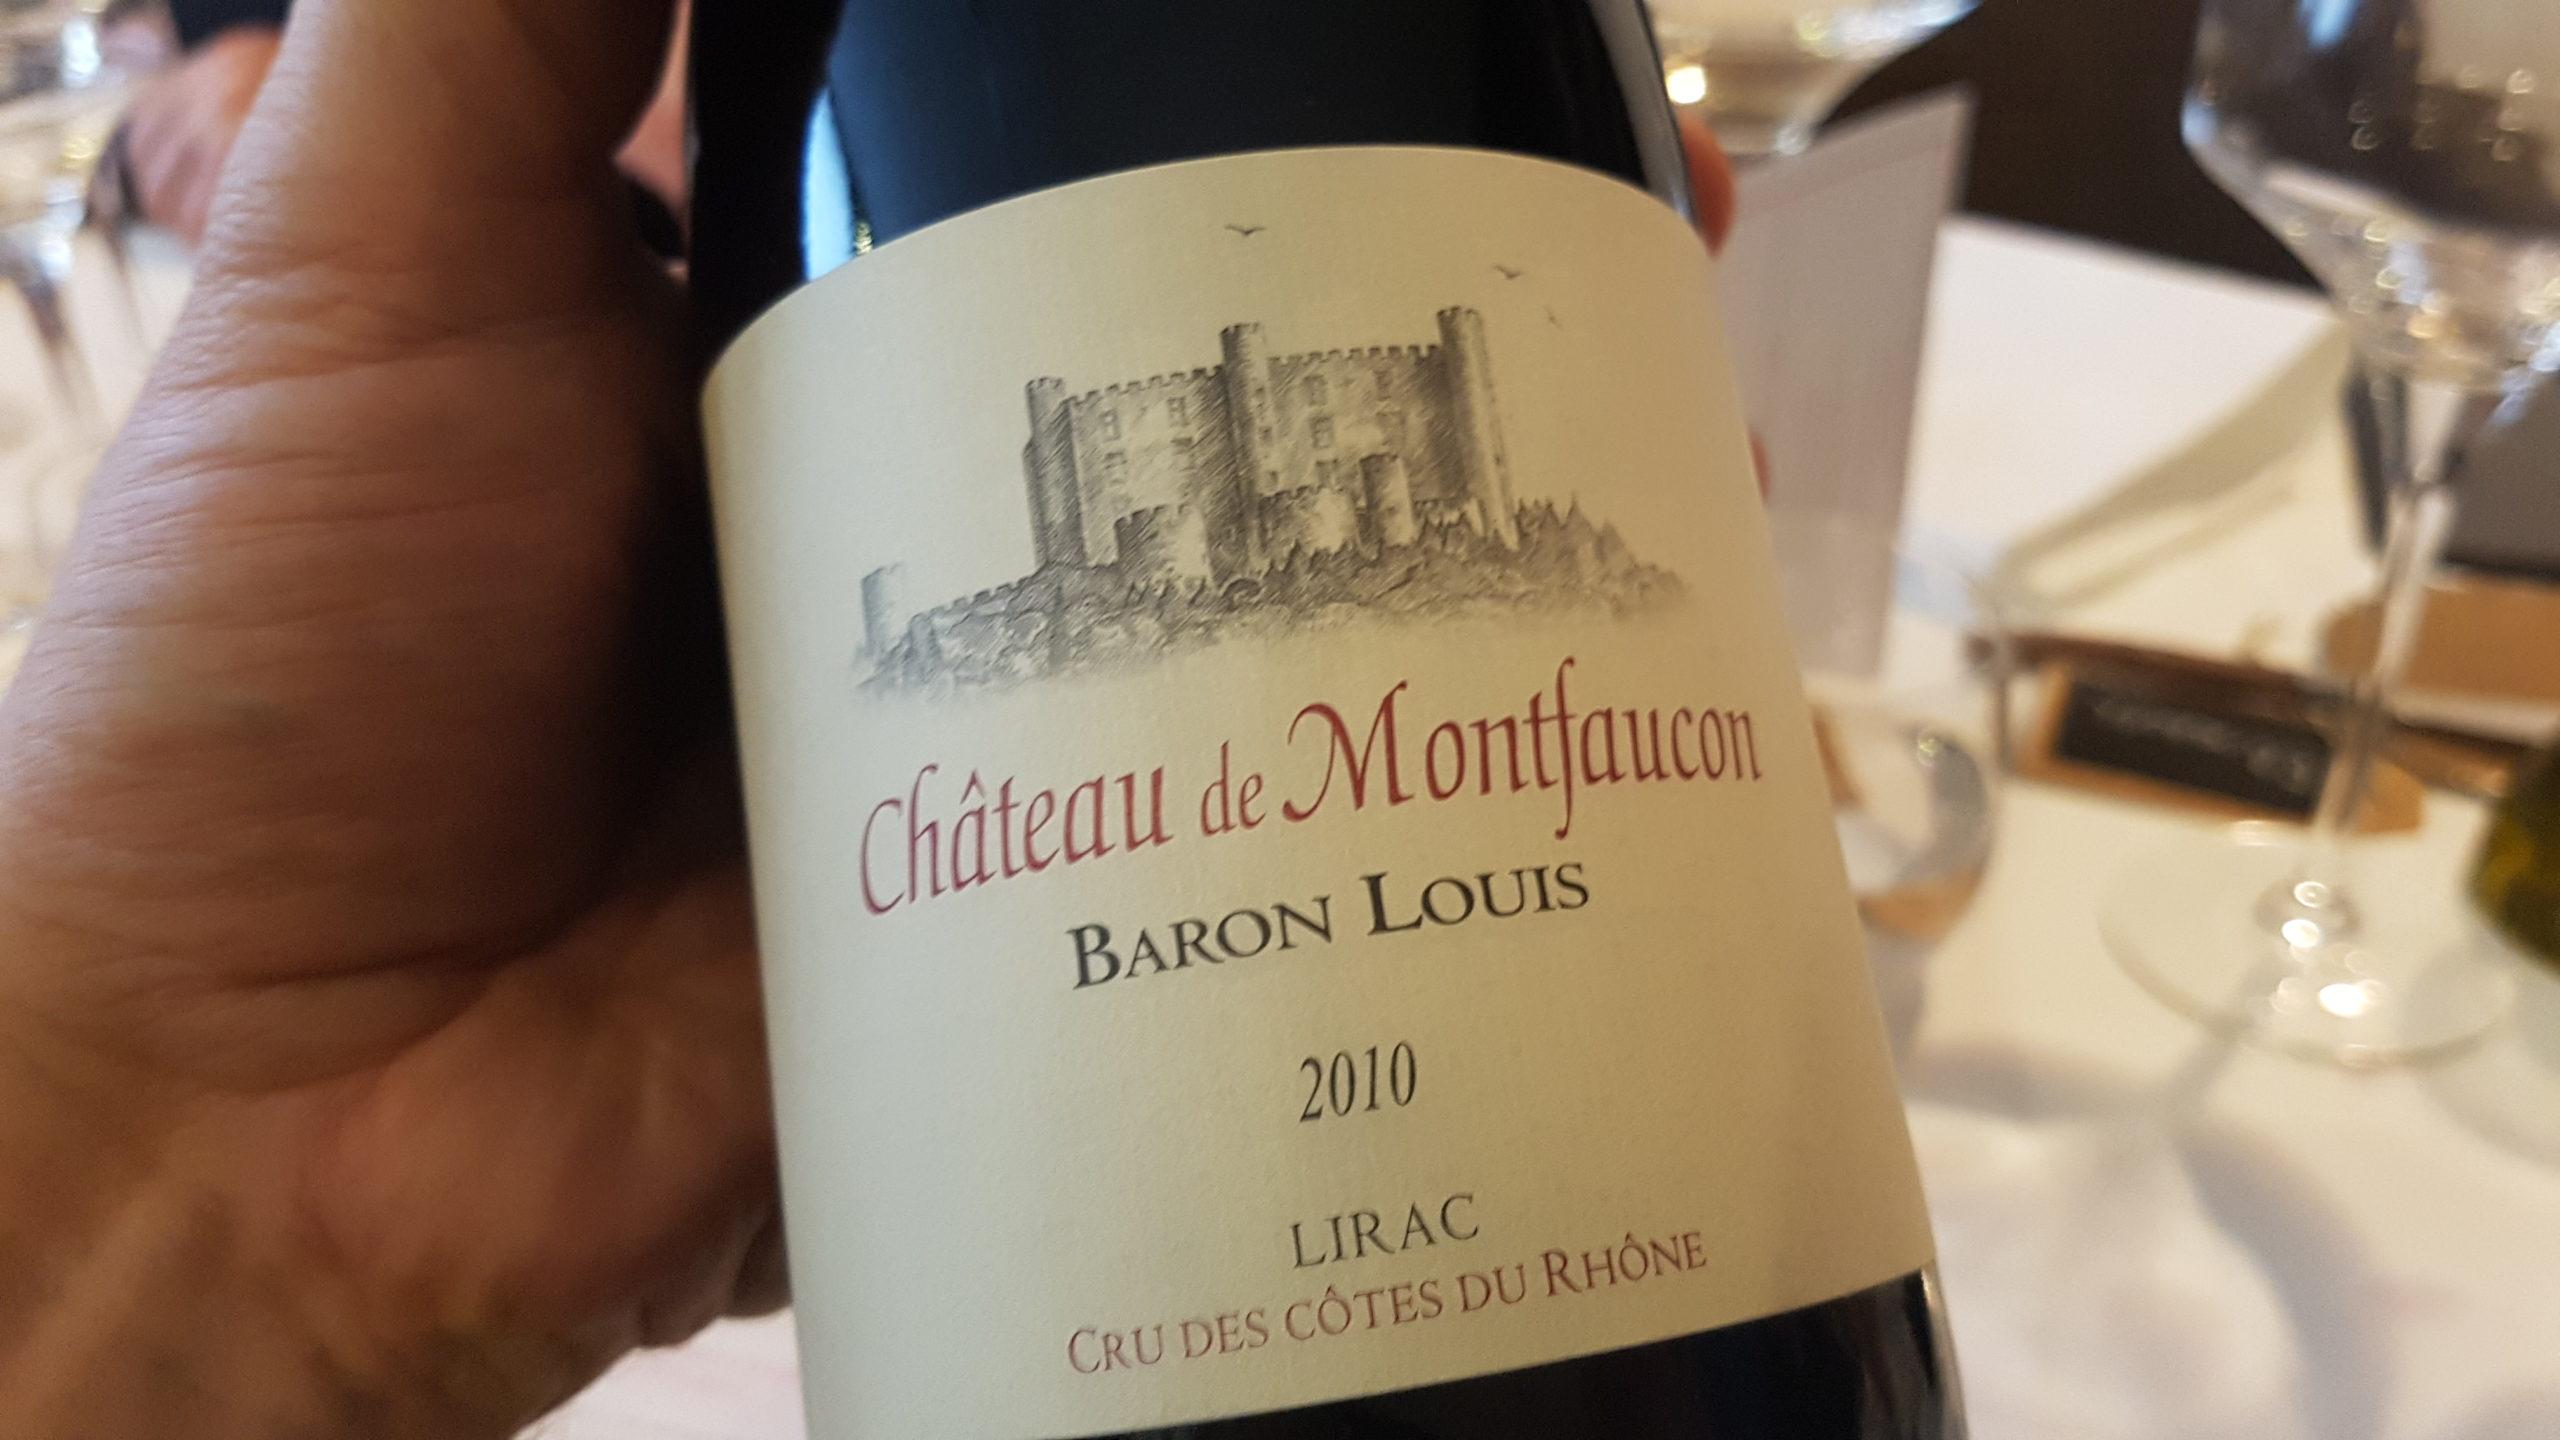 Château de Montfaucon Baron Louis 2010 – Lirac